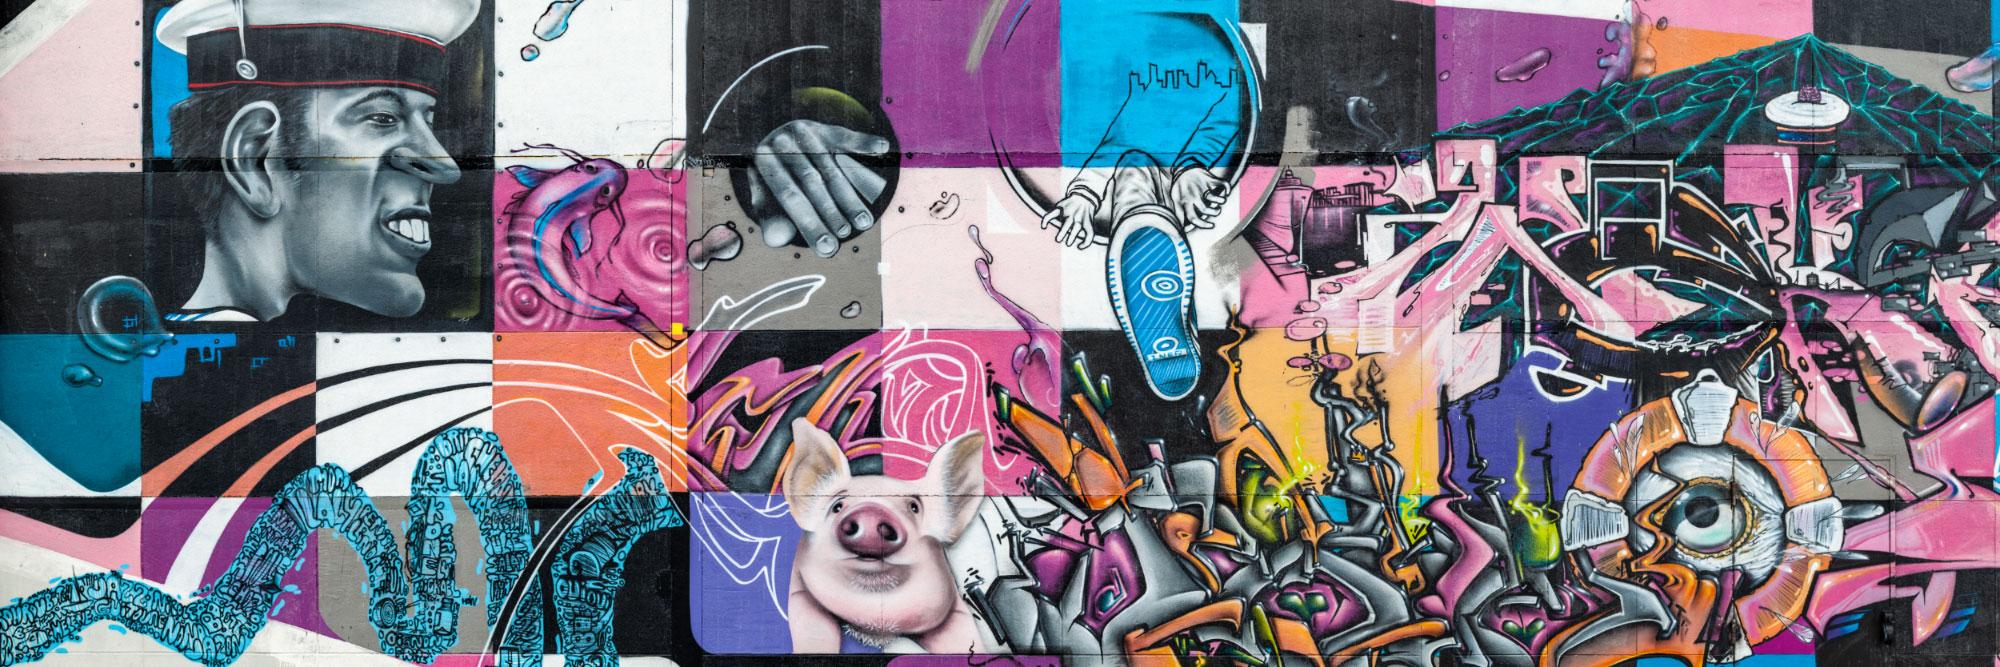 Graff, Hangar 181, avenue du Grand Cours, Rouen